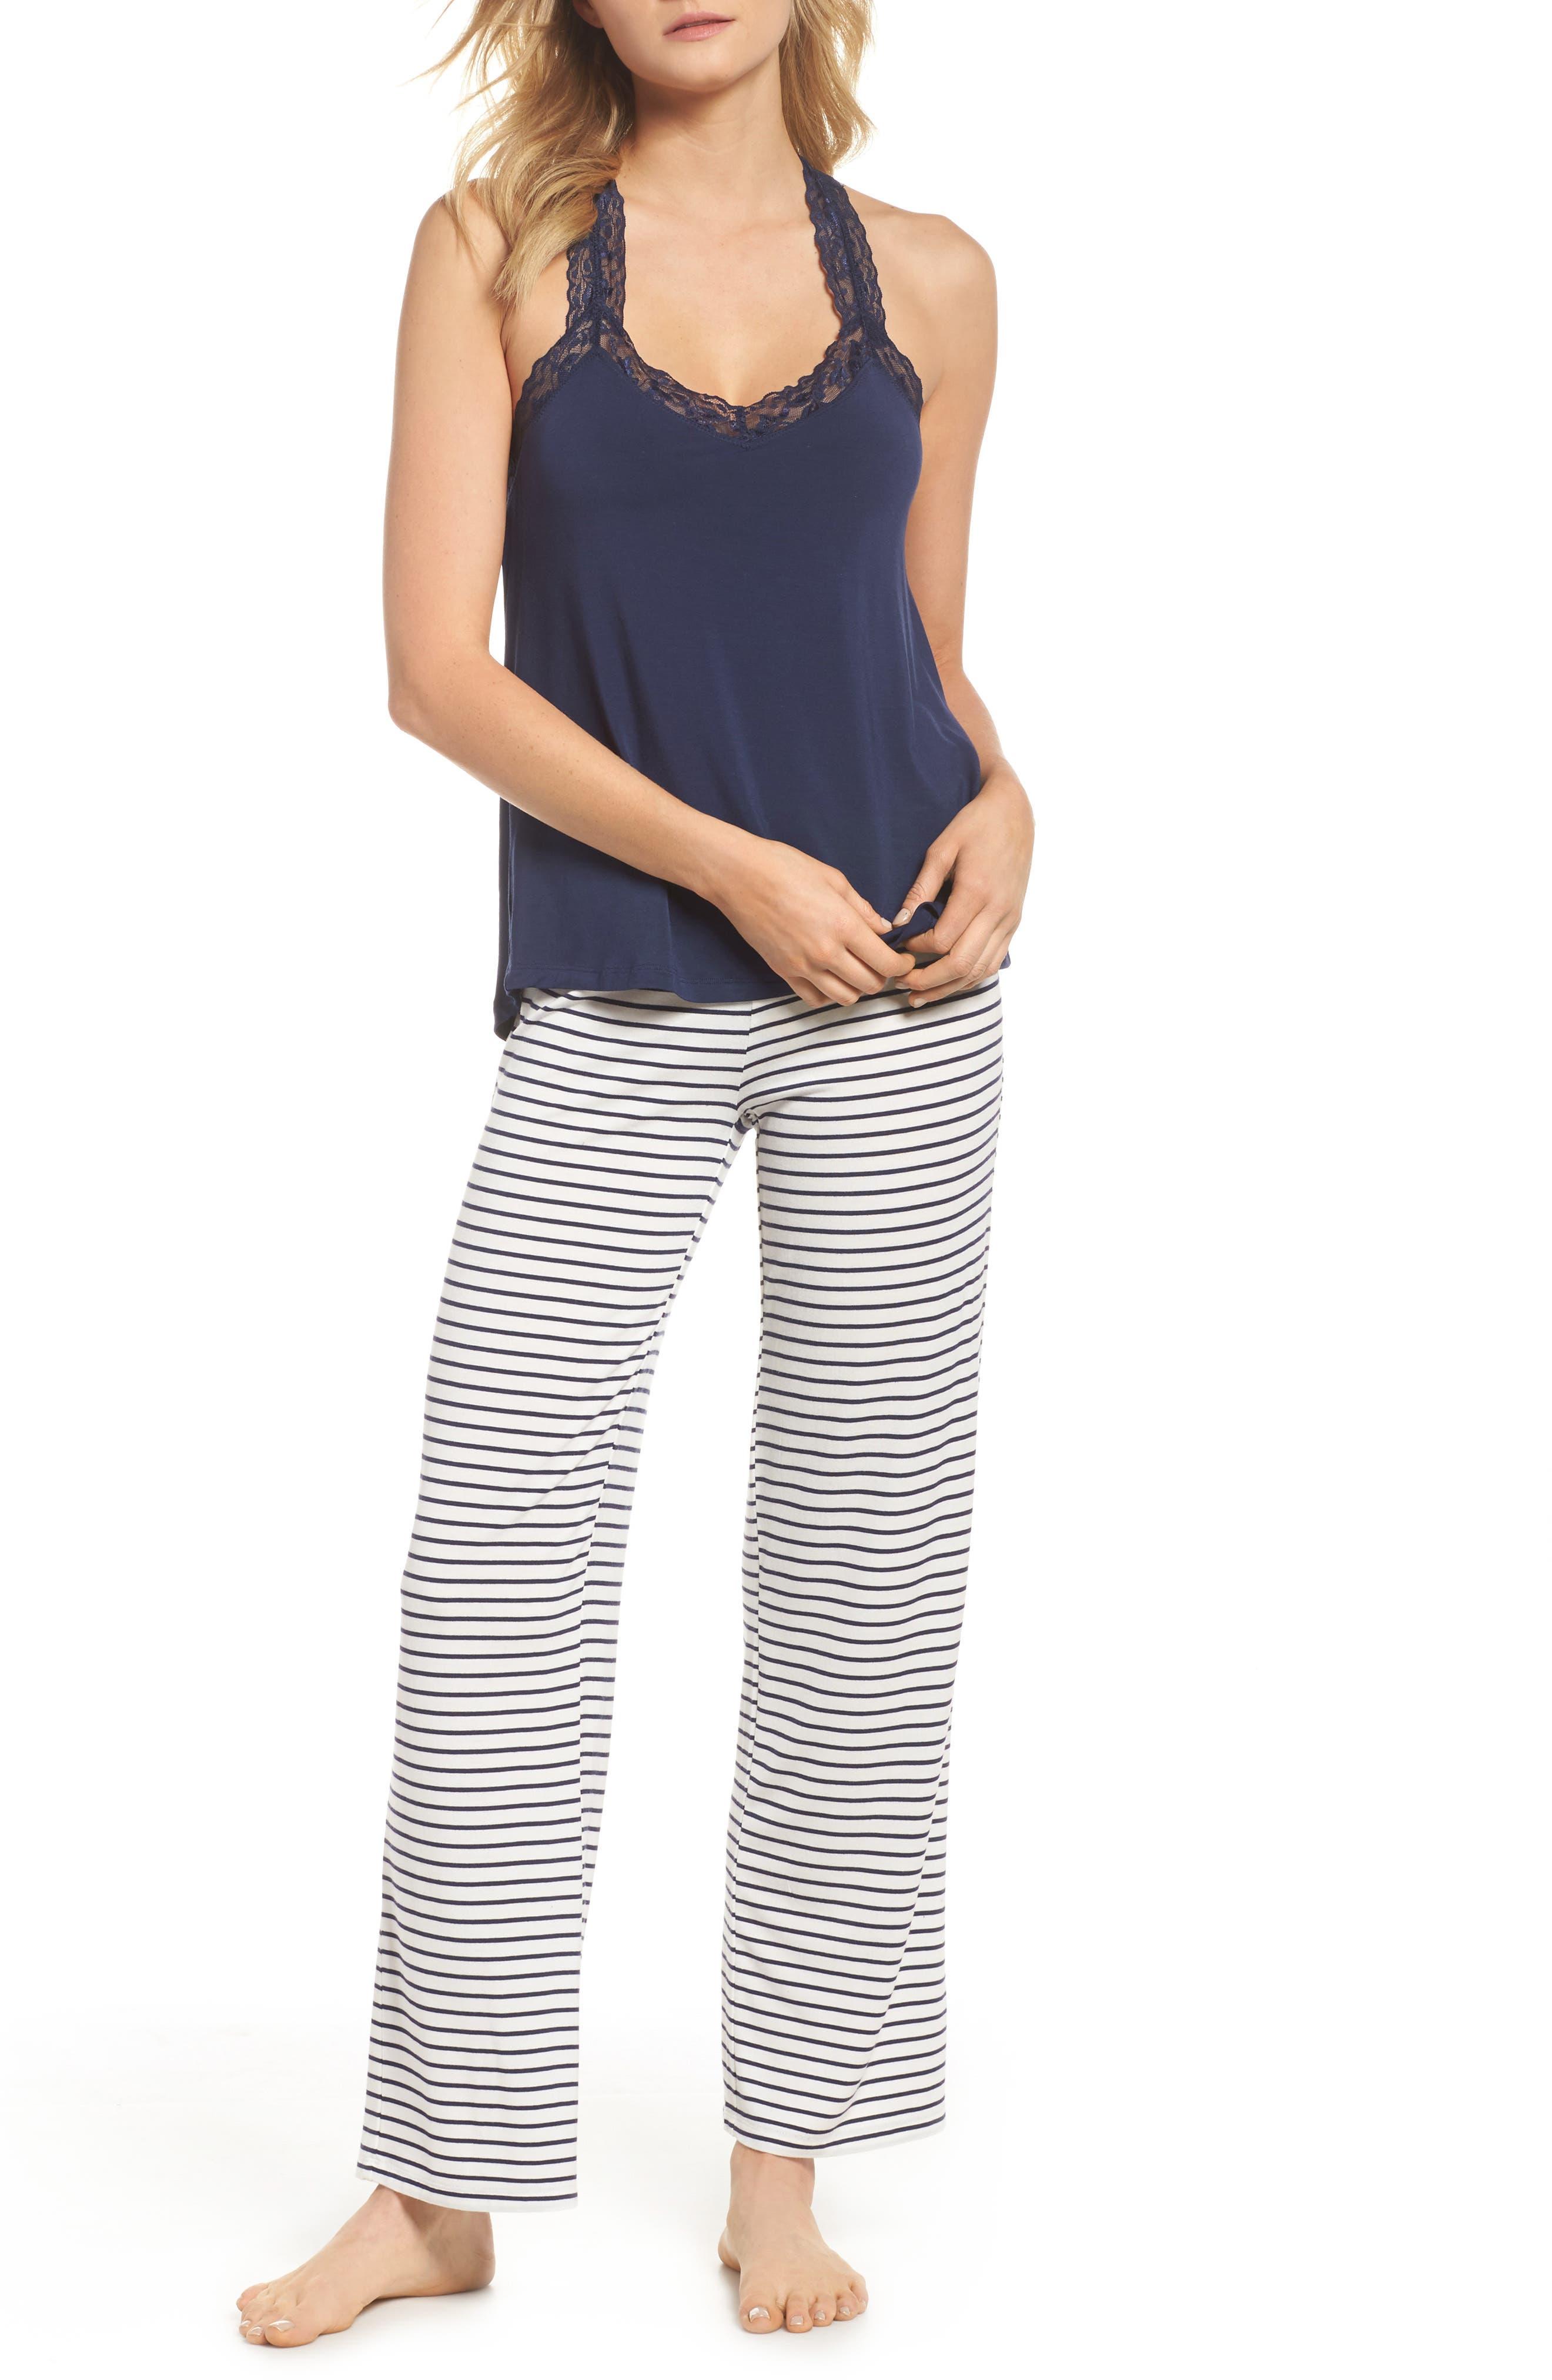 Stripe Pajama Pants,                             Alternate thumbnail 7, color,                             900